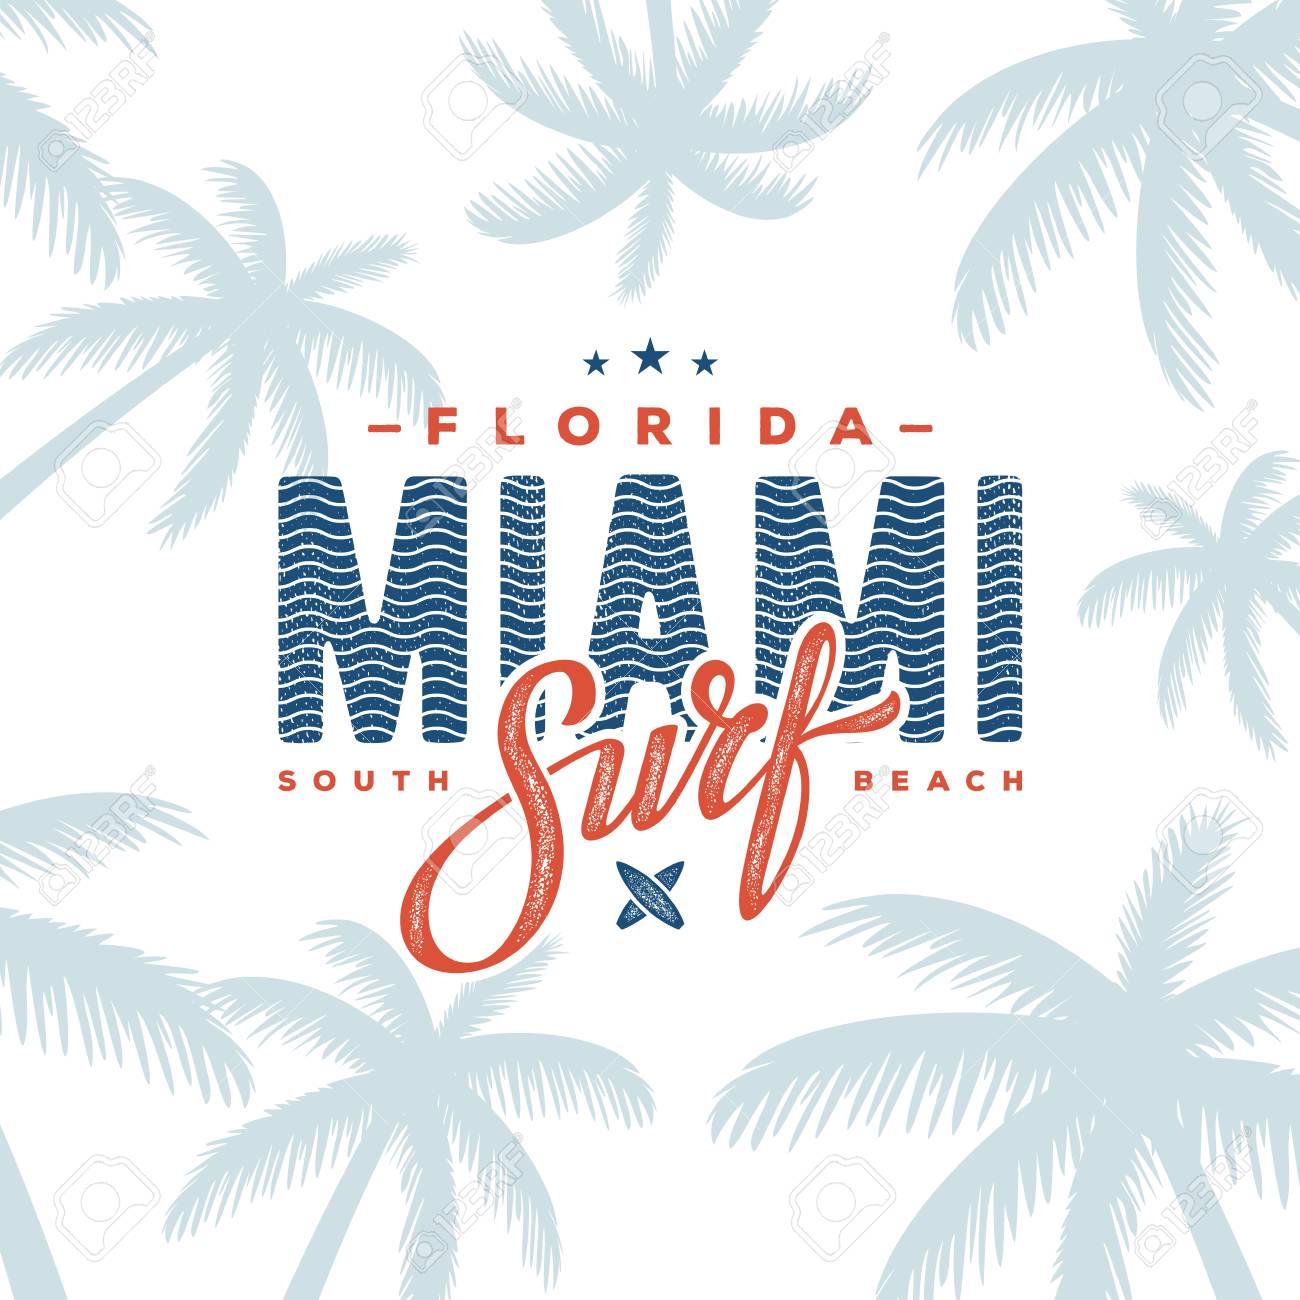 Miami Beach Florida Tee Print With Palm Tree T Shirt Design